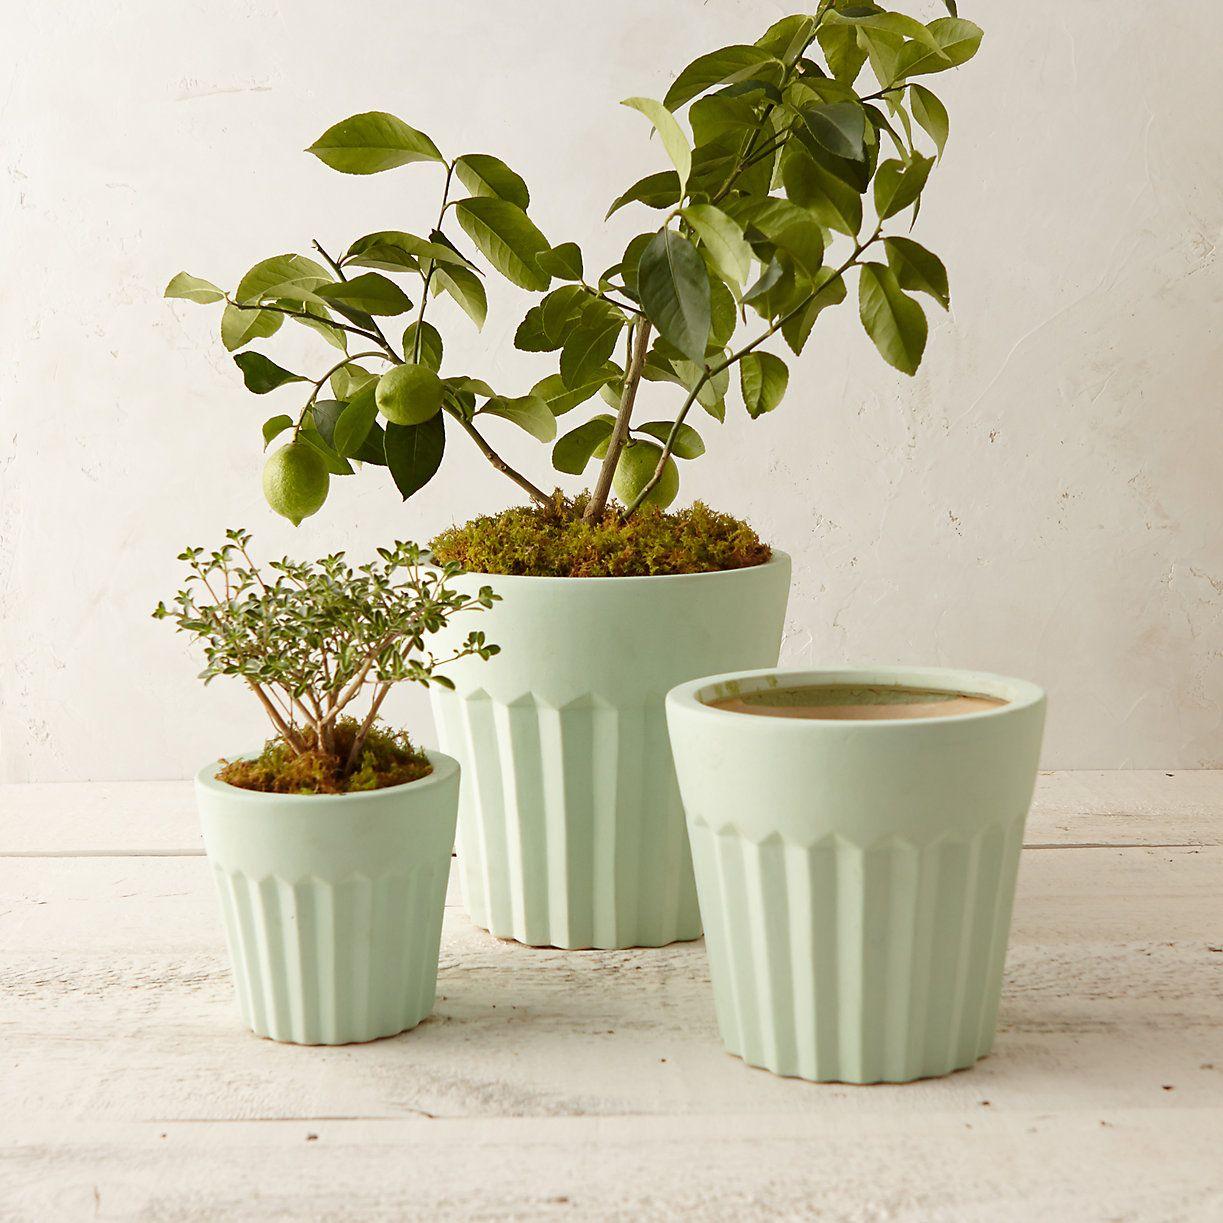 Earthenware Cupcake Pot in New Garden at Terrain